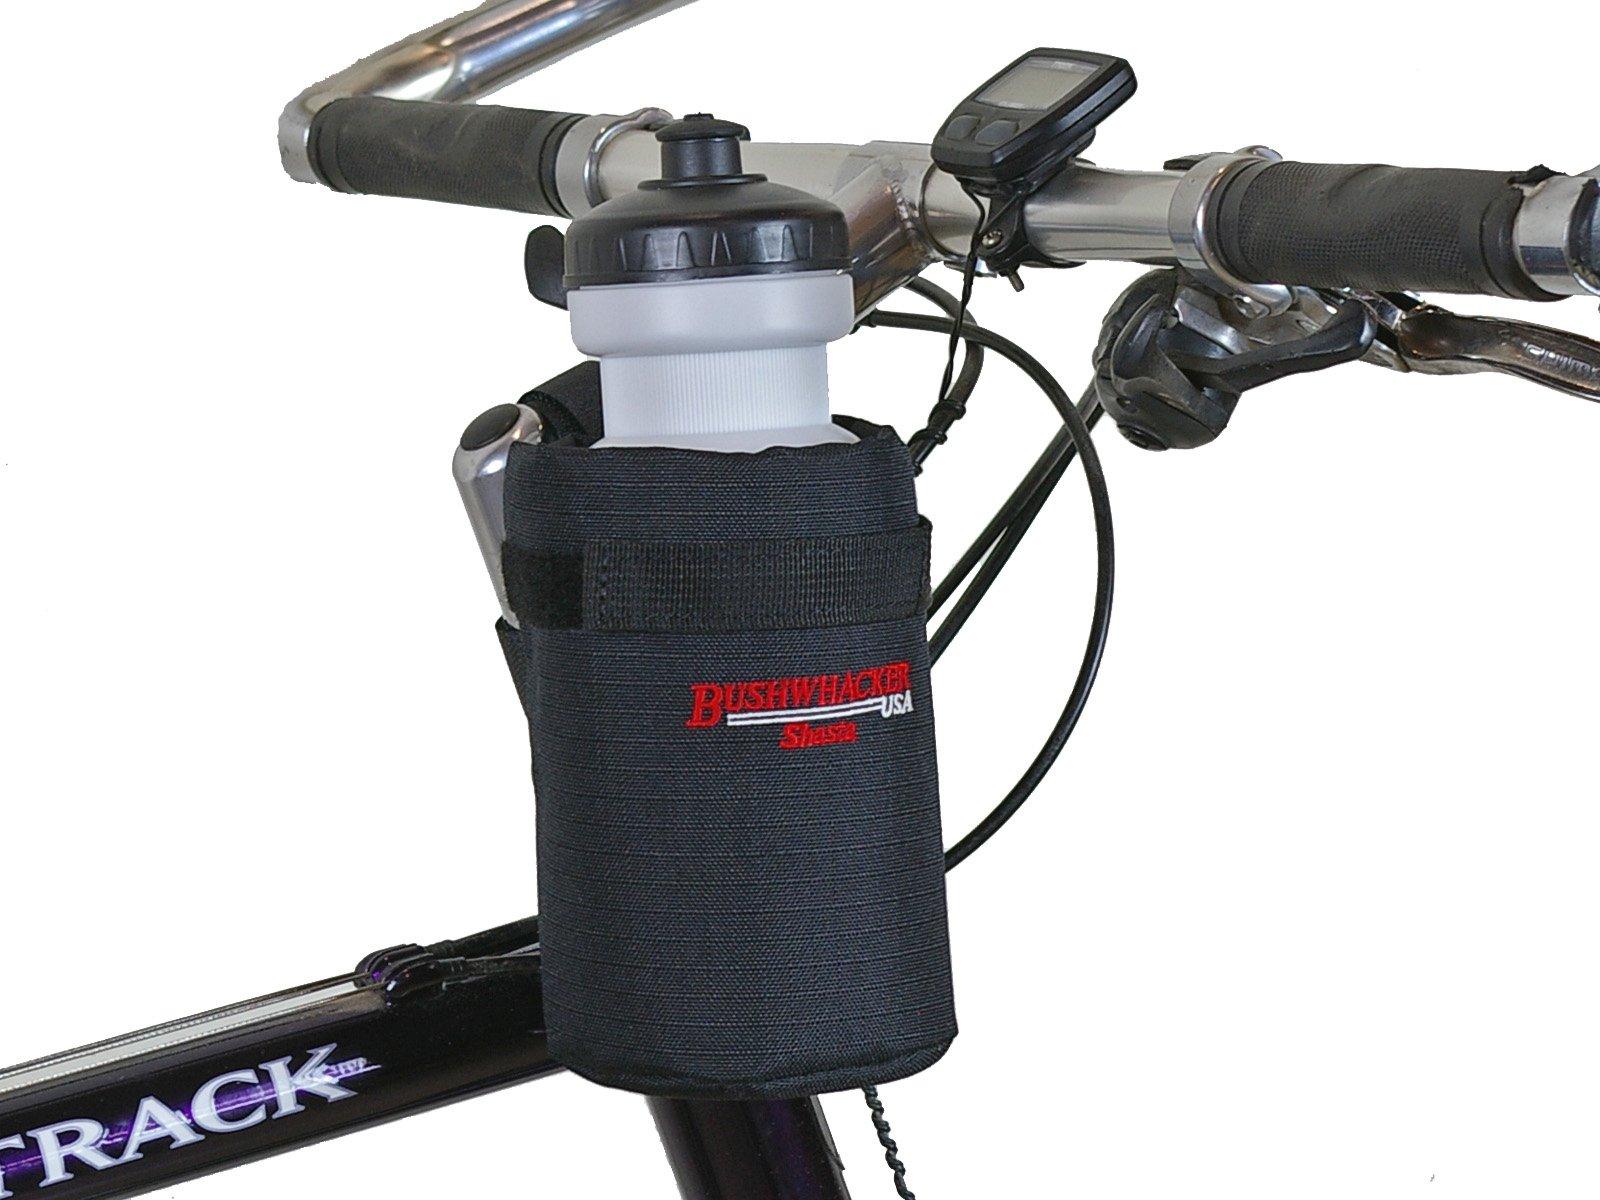 Bushwhacker Shasta Black - Insulated Bike Water Bottle Holder w/ 20 oz. Bottle - Two Point Bike Frame & Handlebar Attachment w/ Belt Loop